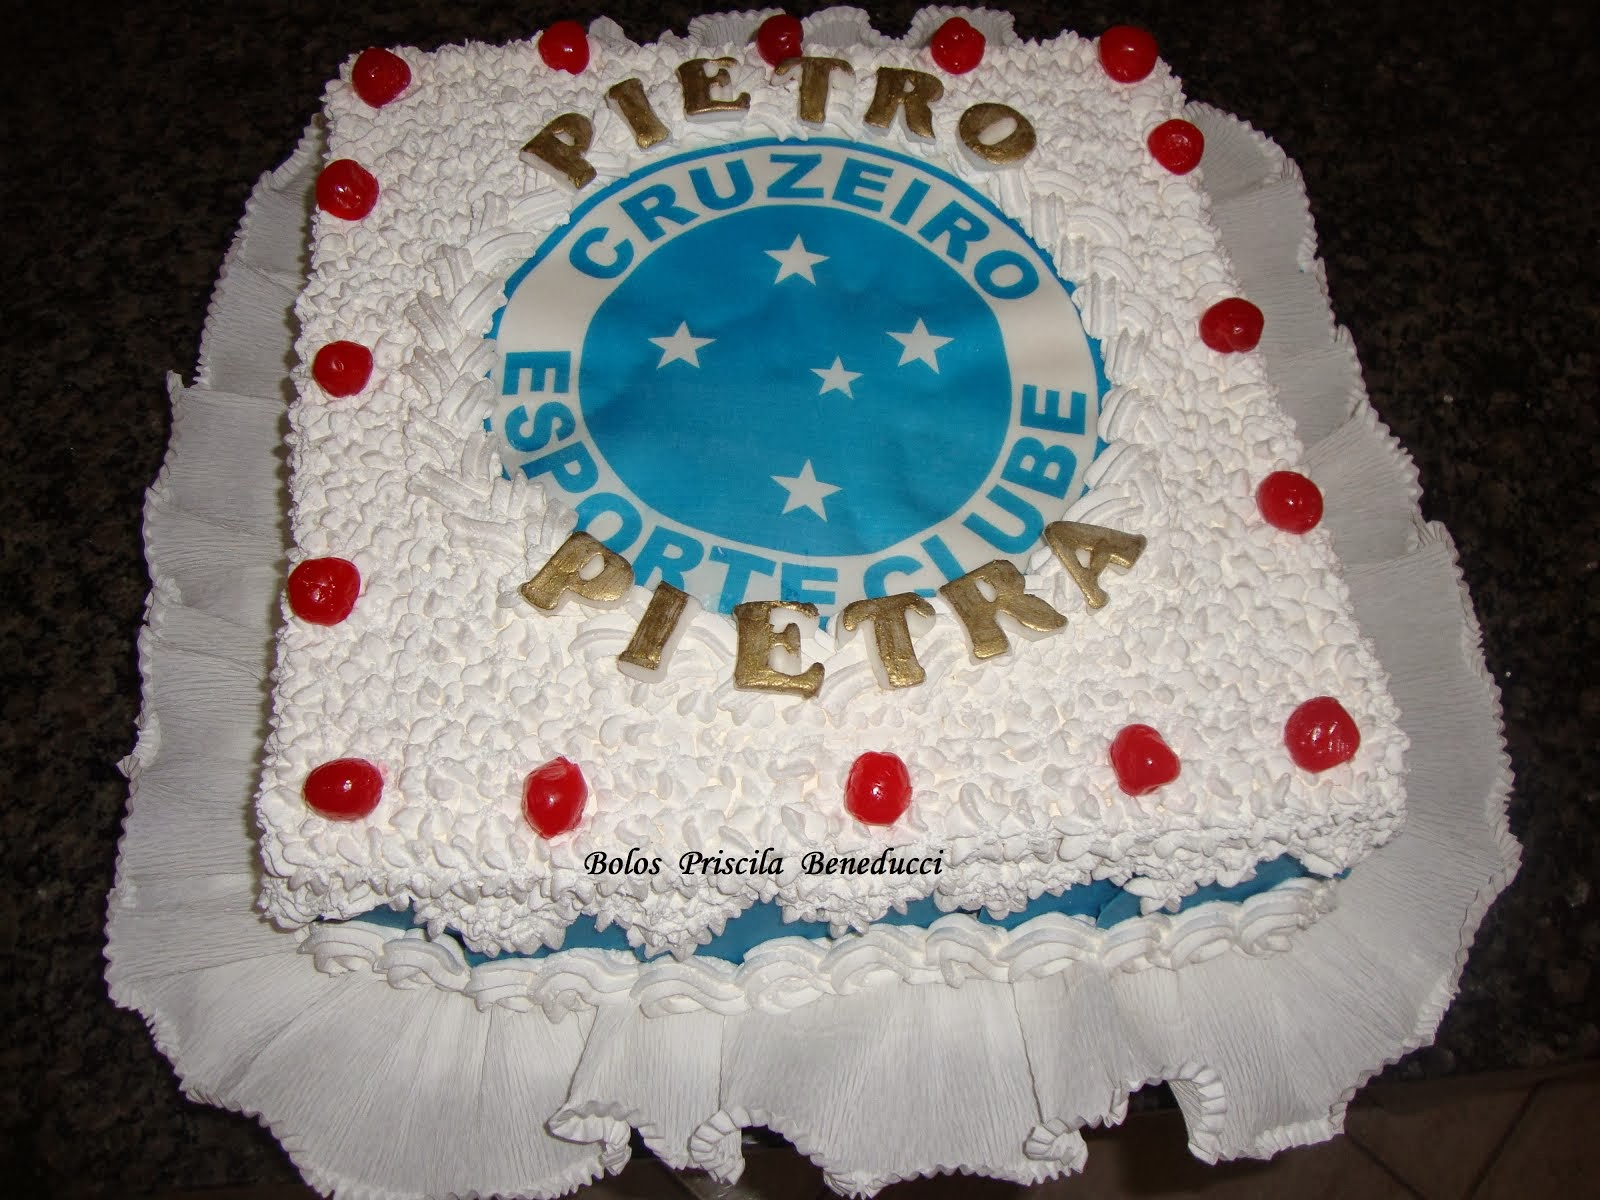 Bolo Cruzeiro